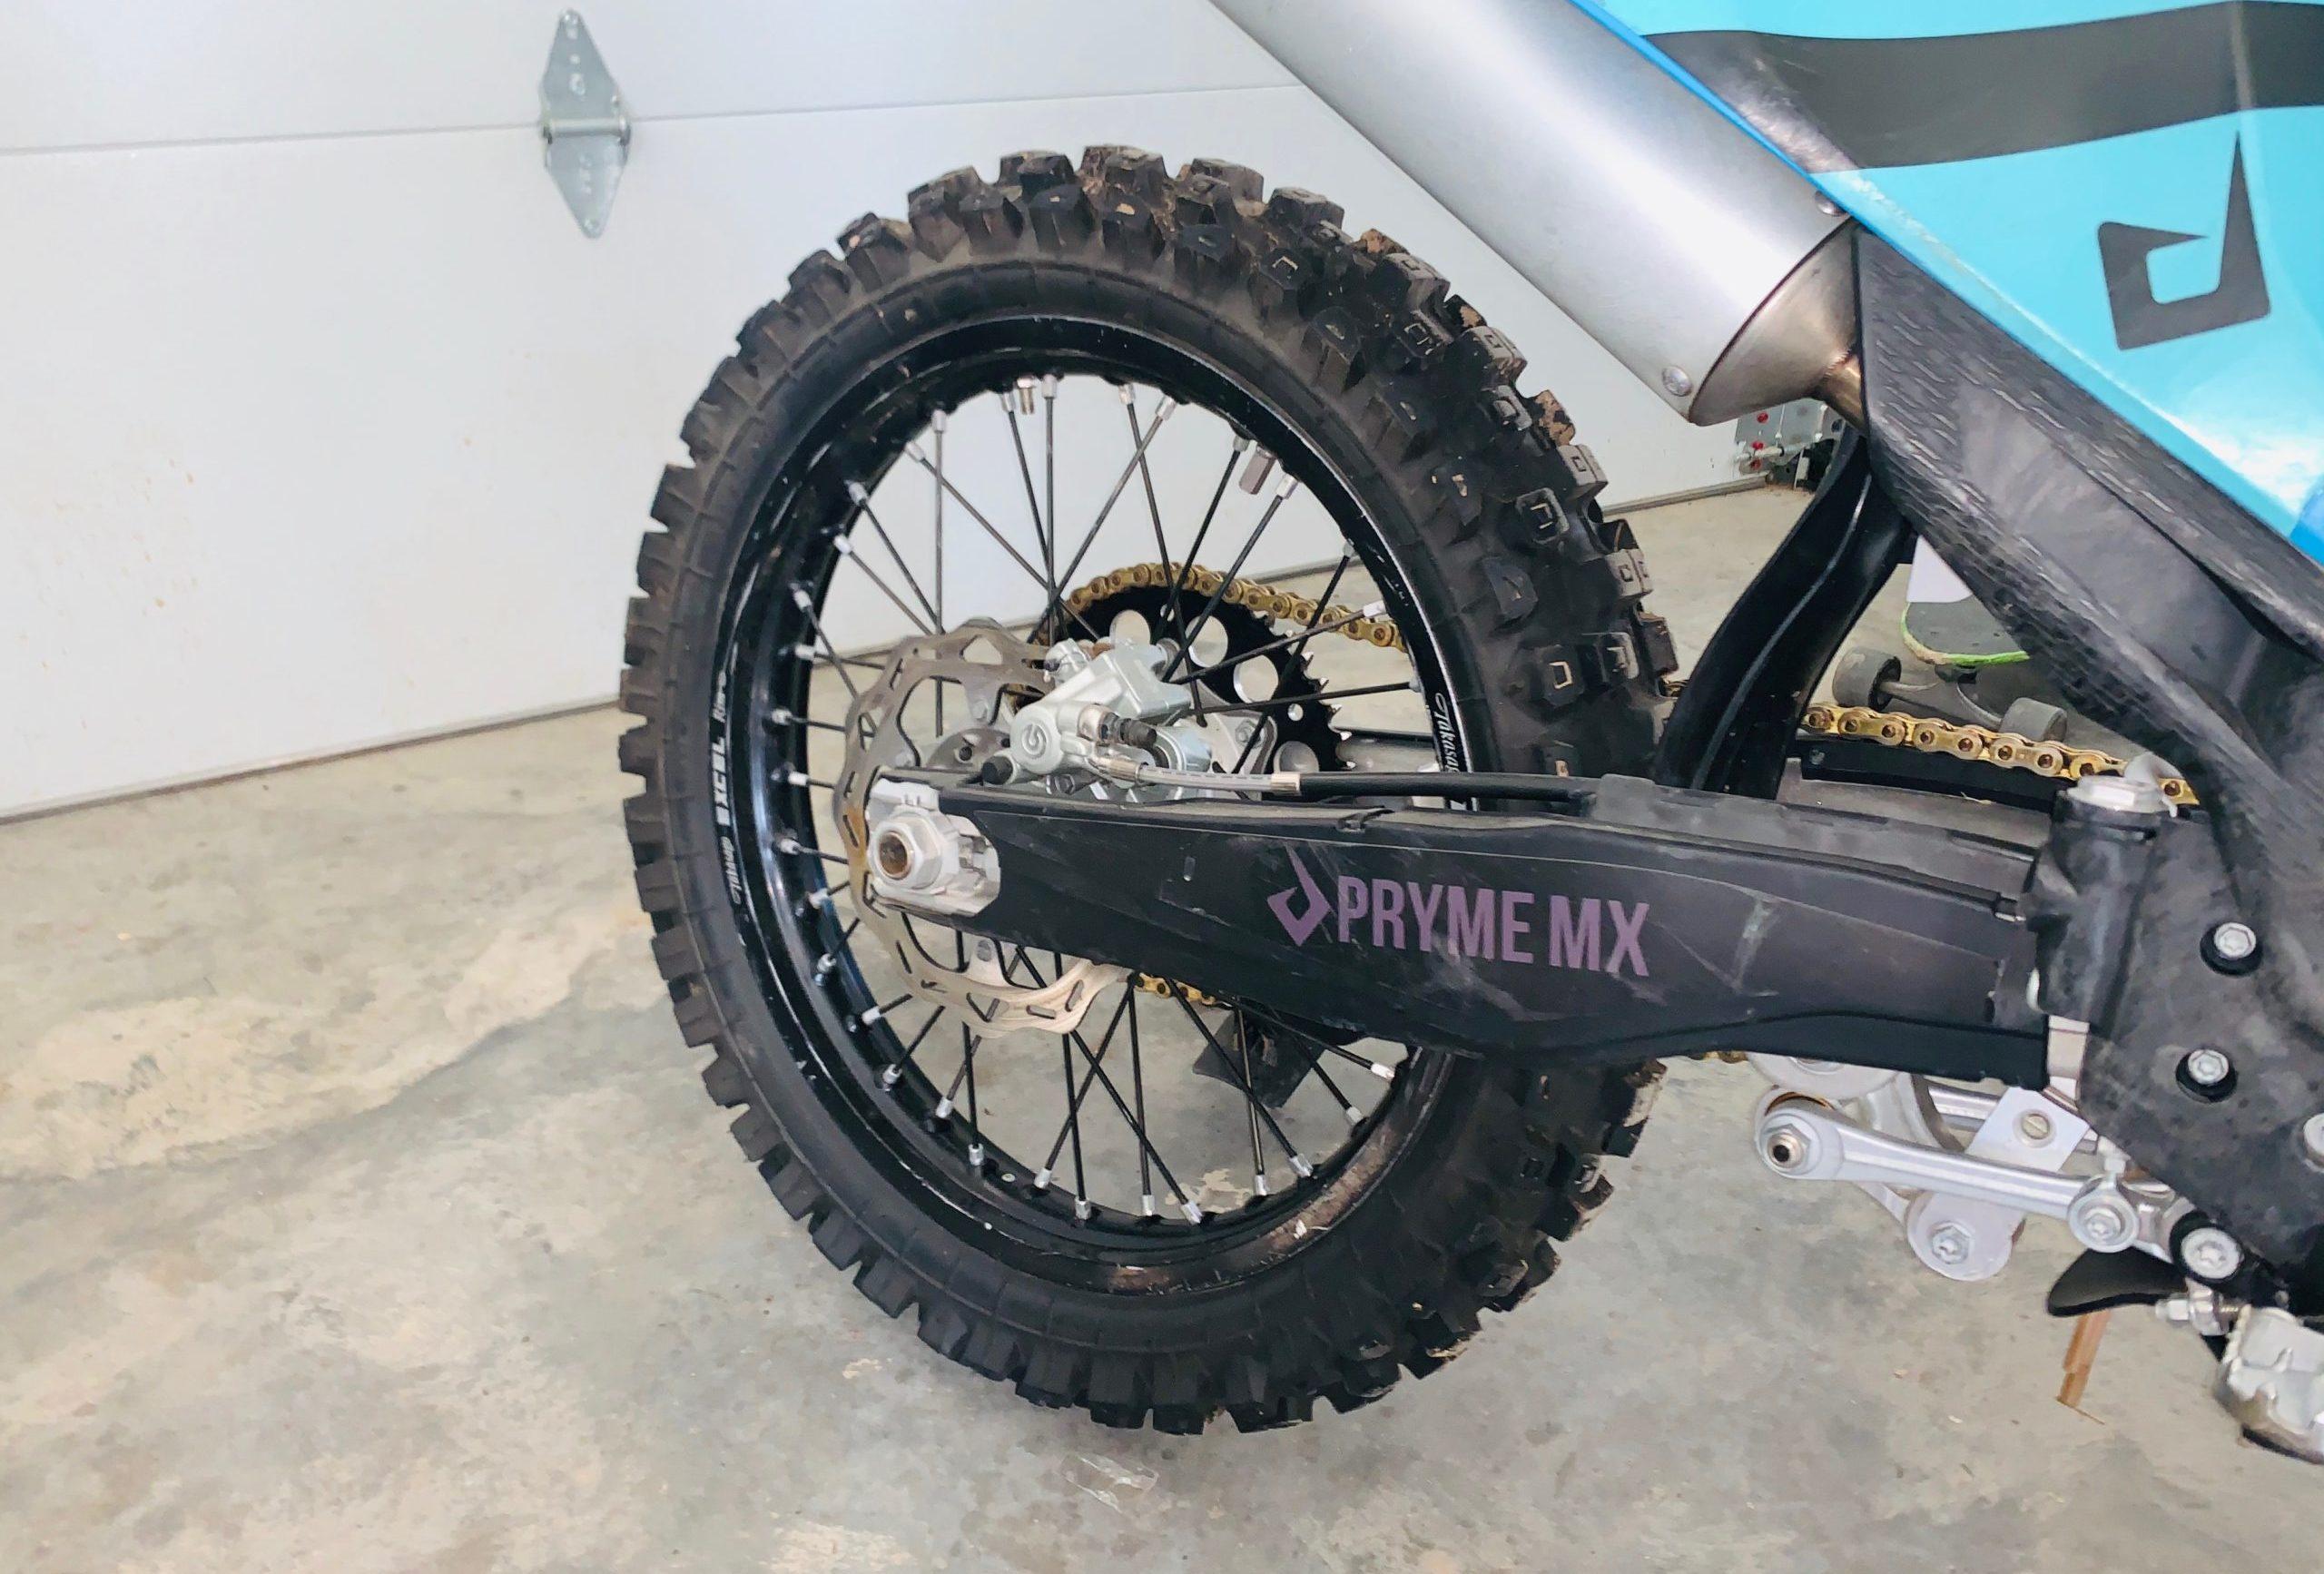 Best Dirt Bike Tires 2020